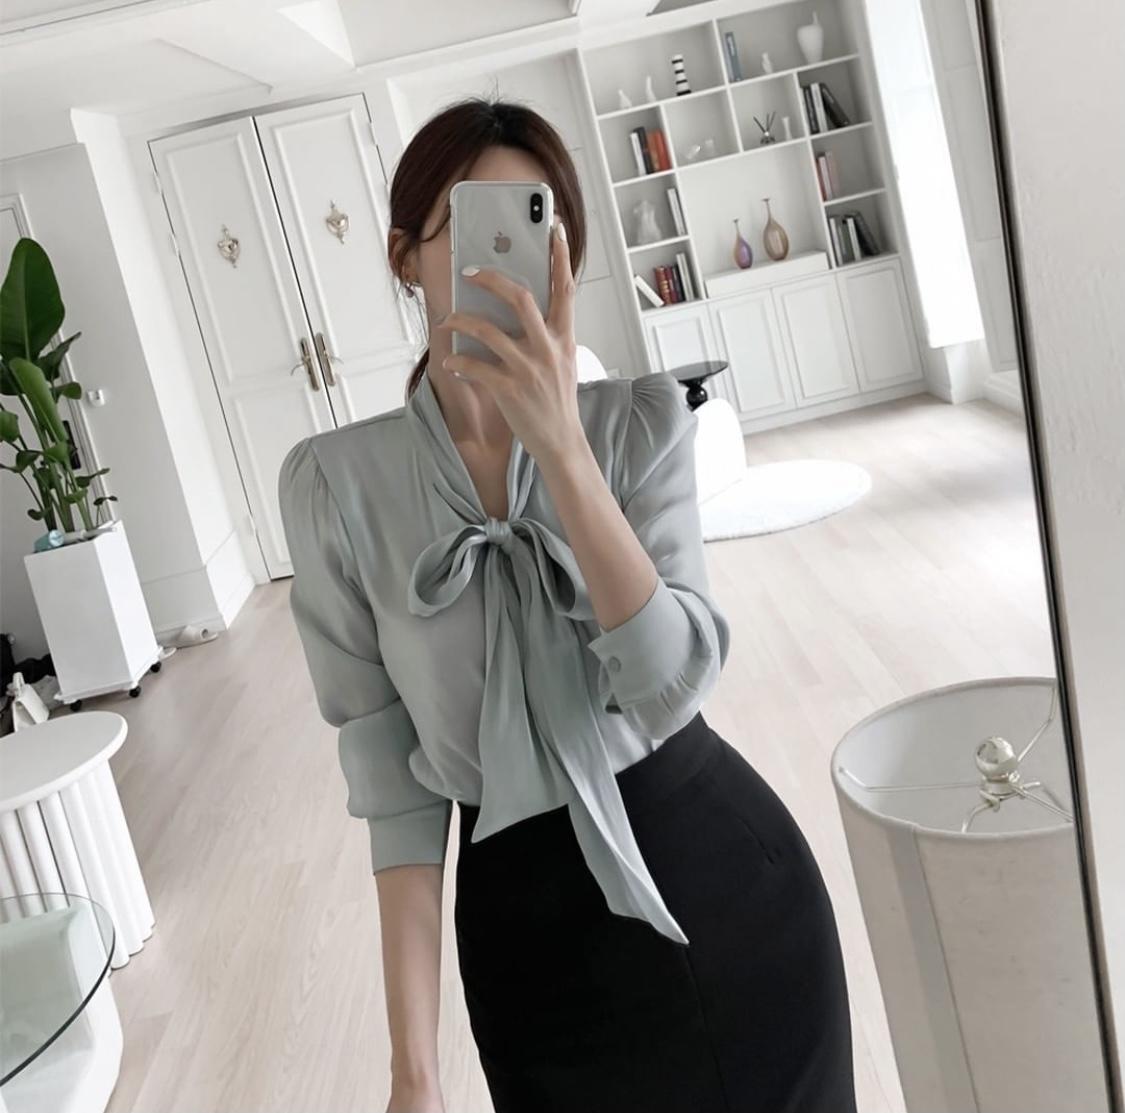 beddiary_tightskirt